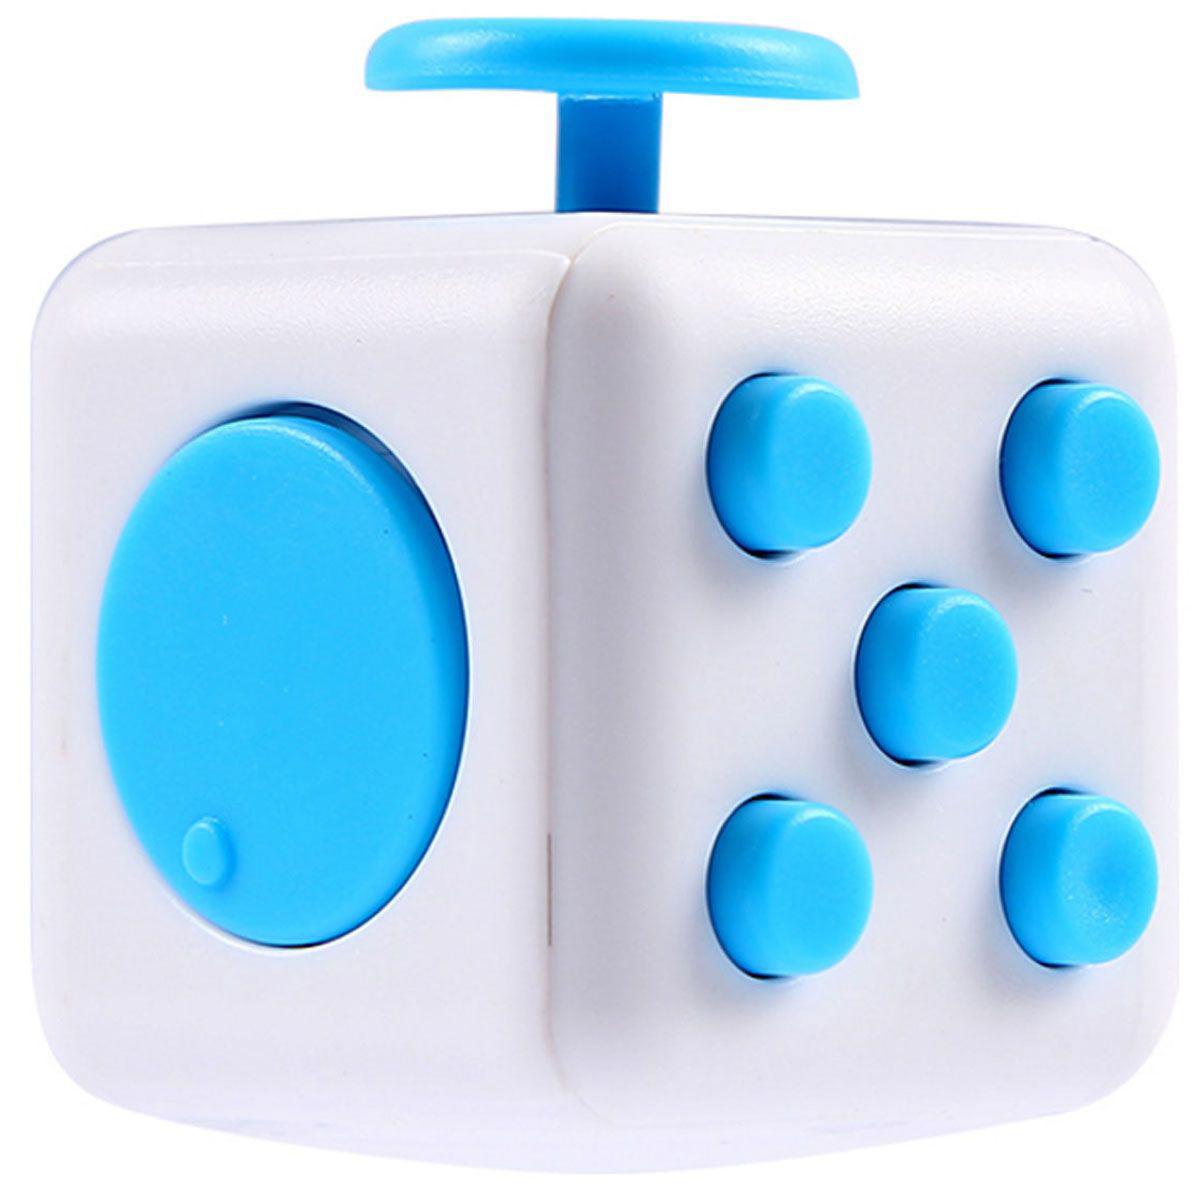 Игрушка антистресс Fidget Cube, акваАнтистресс кубики Fidget Cube<br>Игрушка антистресс Fidget Cube, аква<br>